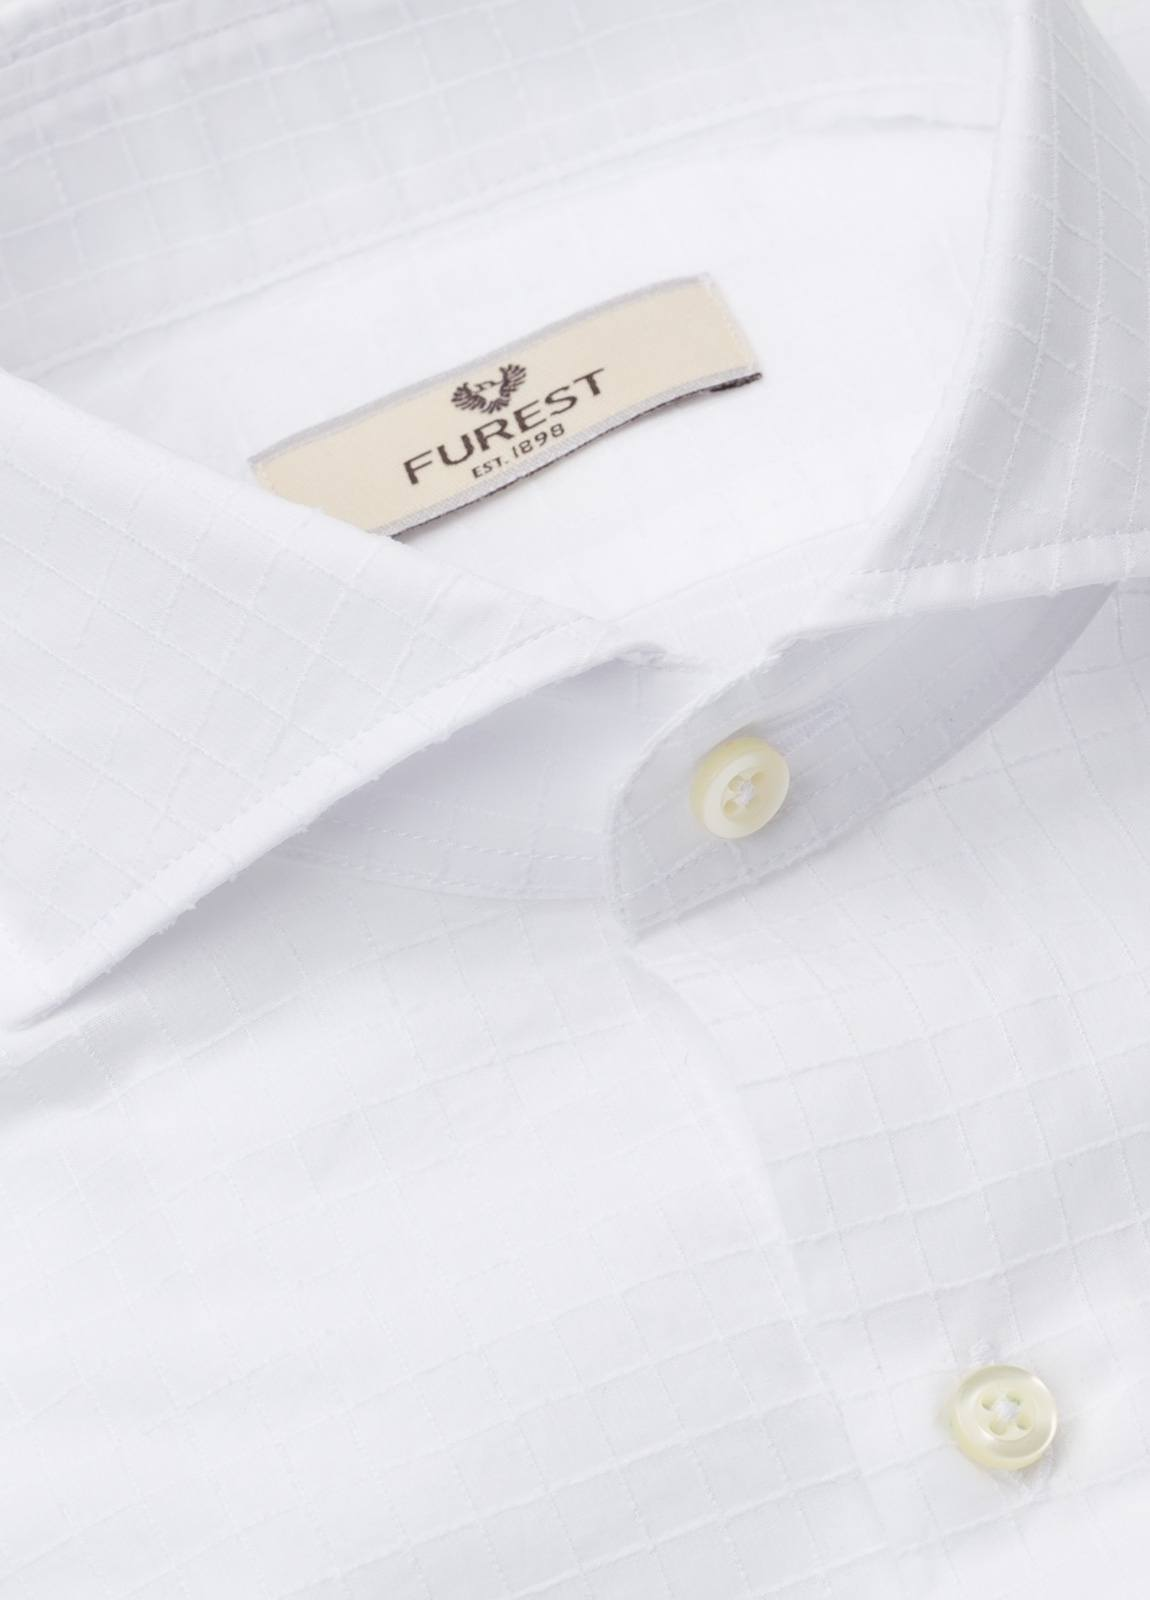 Camisa Leisure Wear SLIM FIT Modelo CAPRI tejido cuadro ventana color blanco, 100% Algodon. - Ítem3